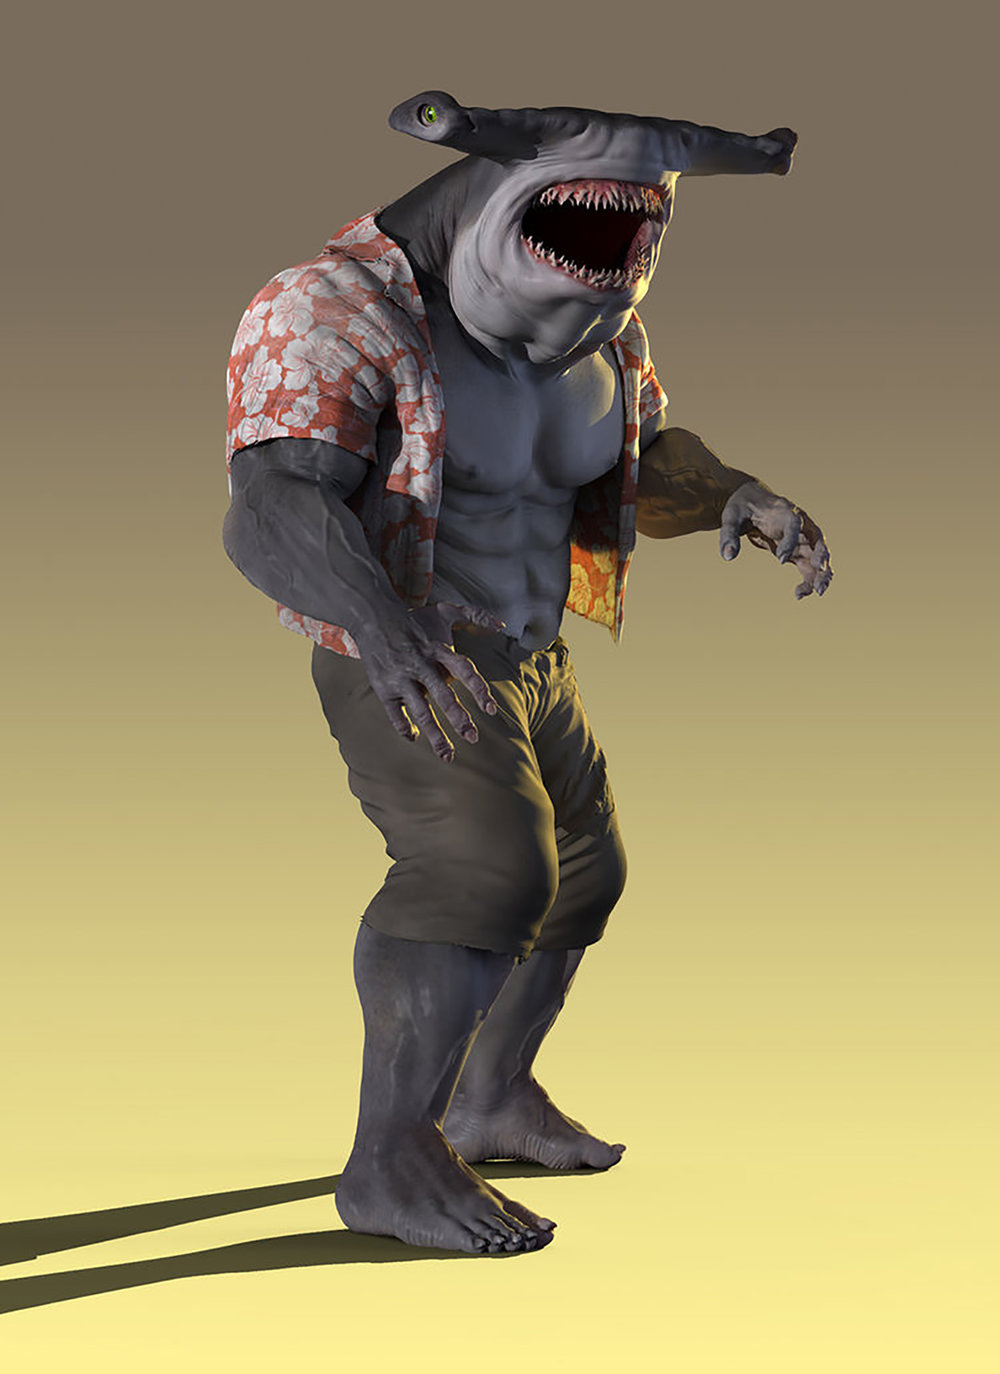 Suicide Squad king shark